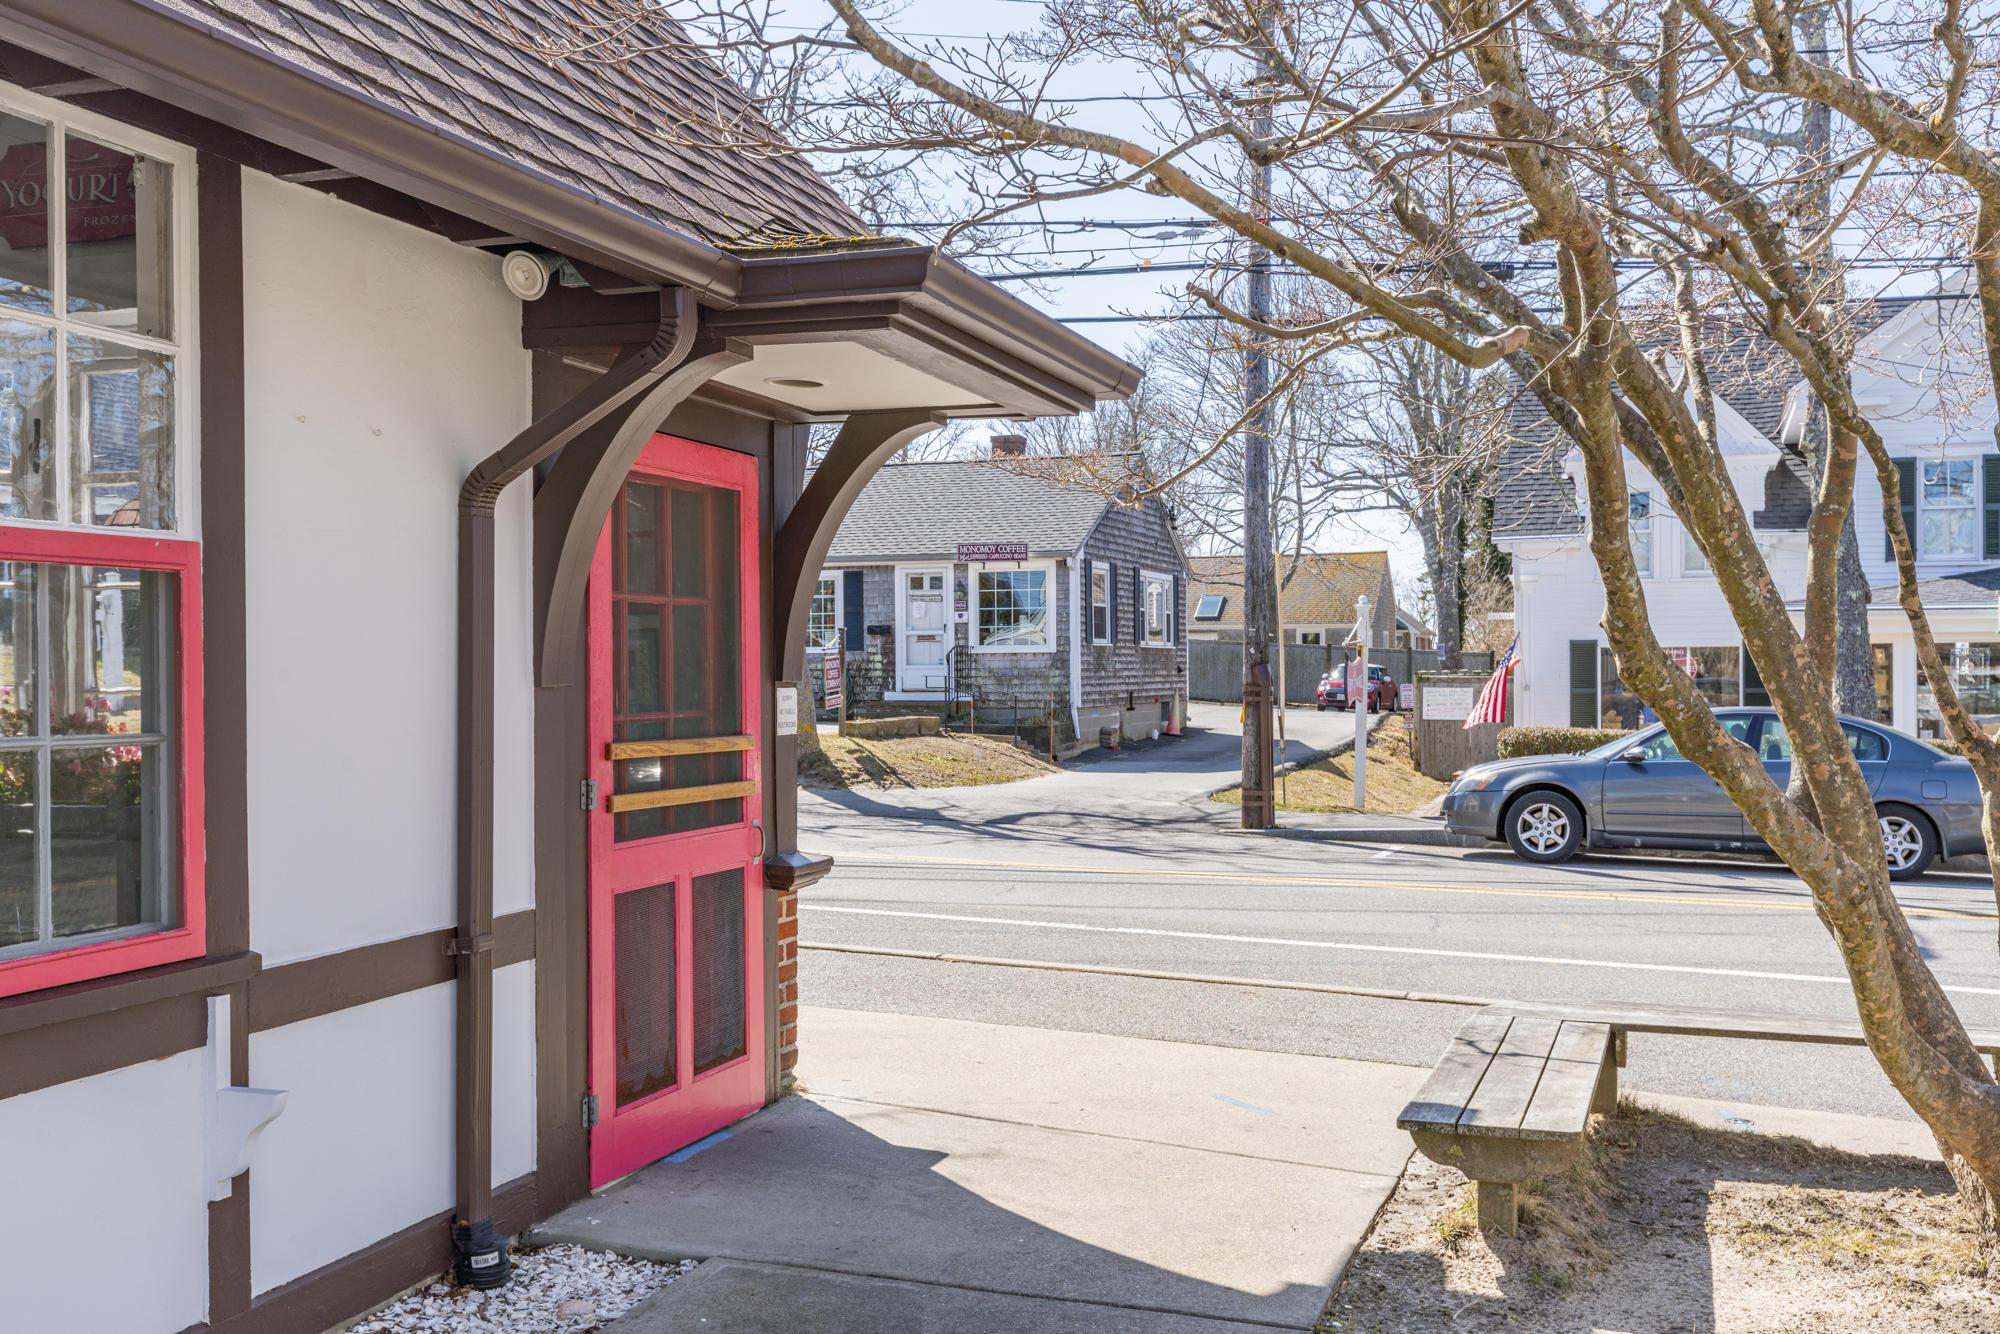 456 Main Street, Chatham, MA  02633 - slide 16